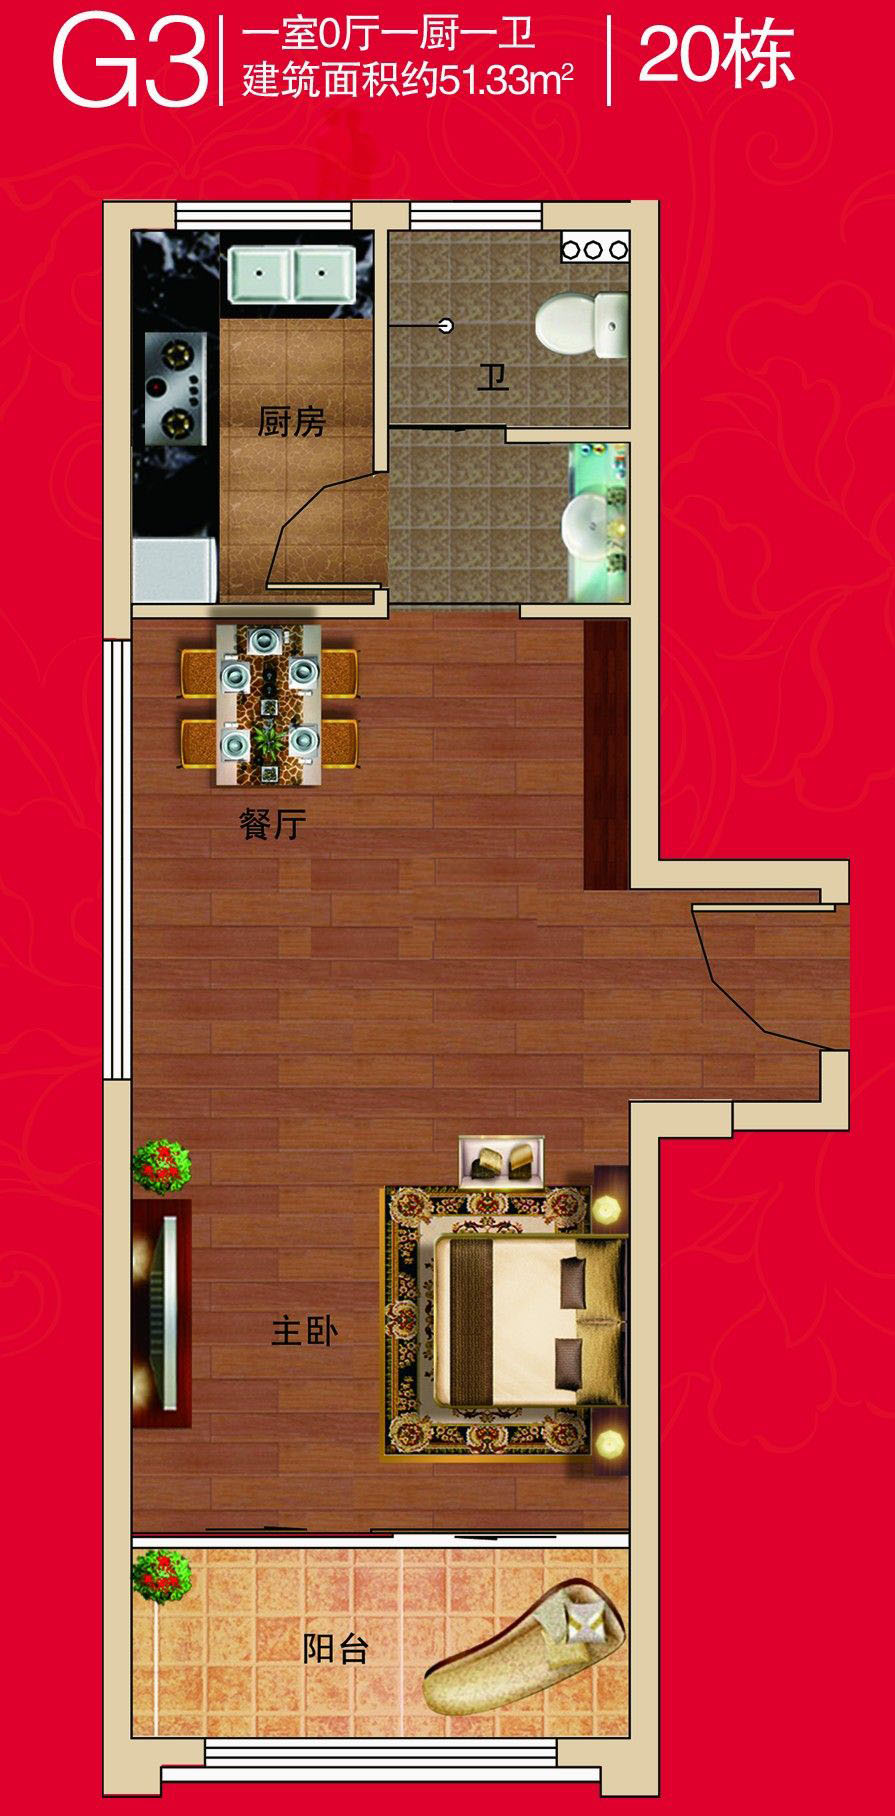 G3户型 51.33㎡ 1室0厅